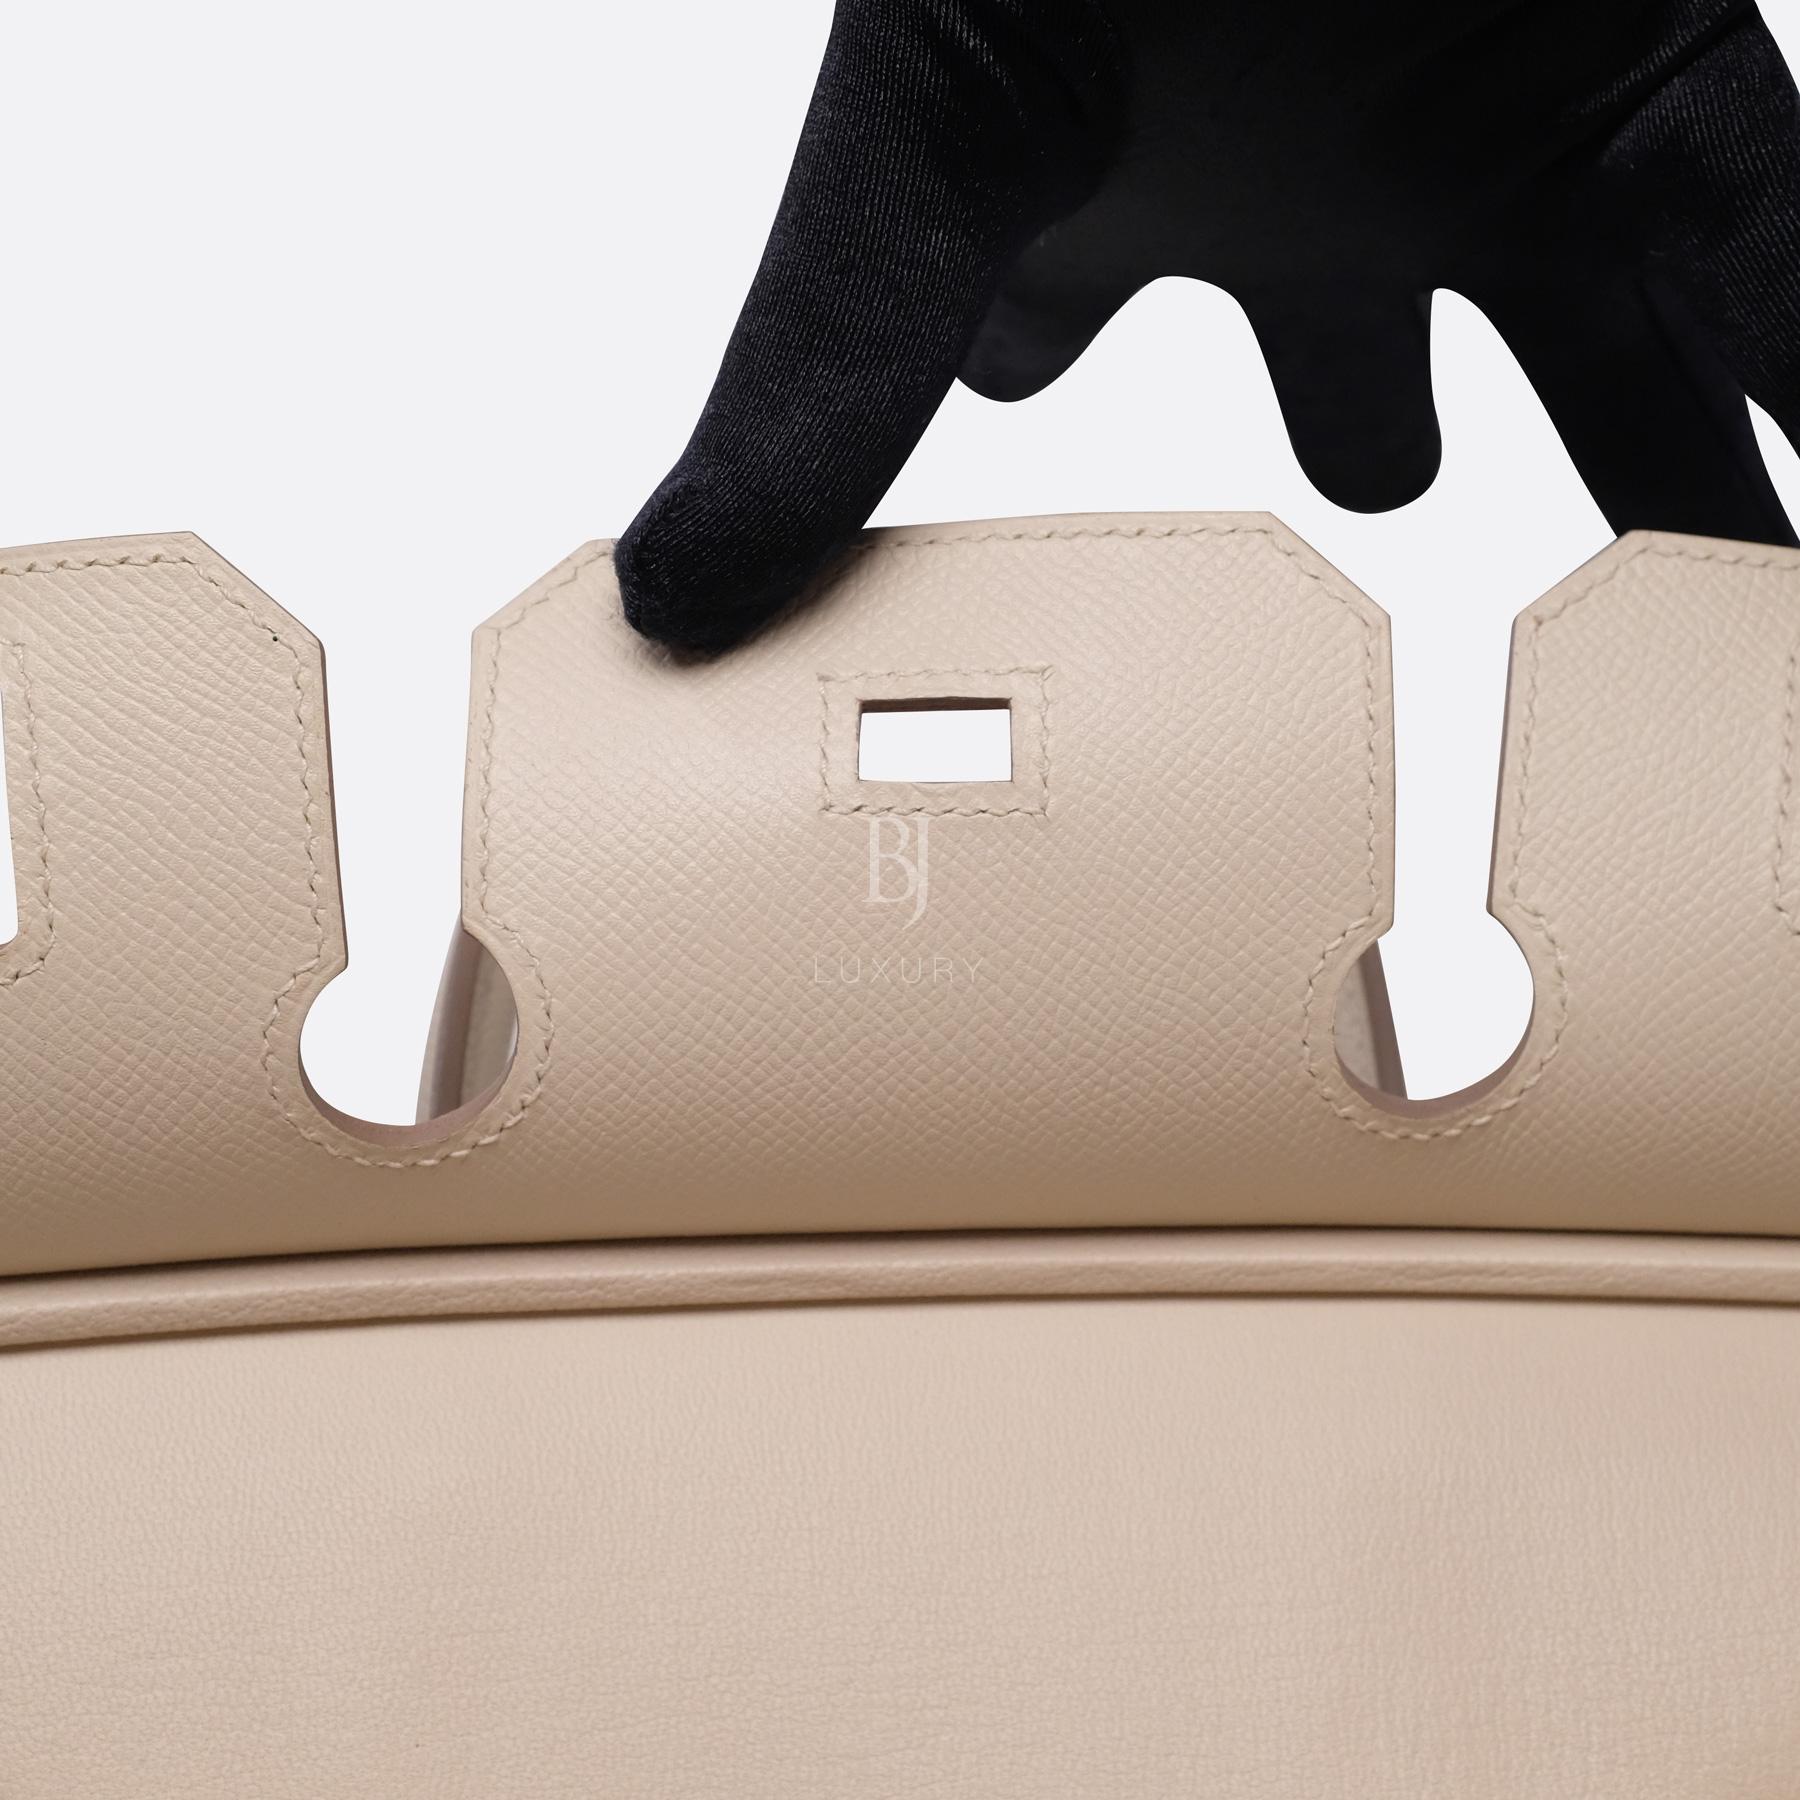 Hermes Birkin 30 Epsom Craie Palladium BJ Luxury 5.jpg